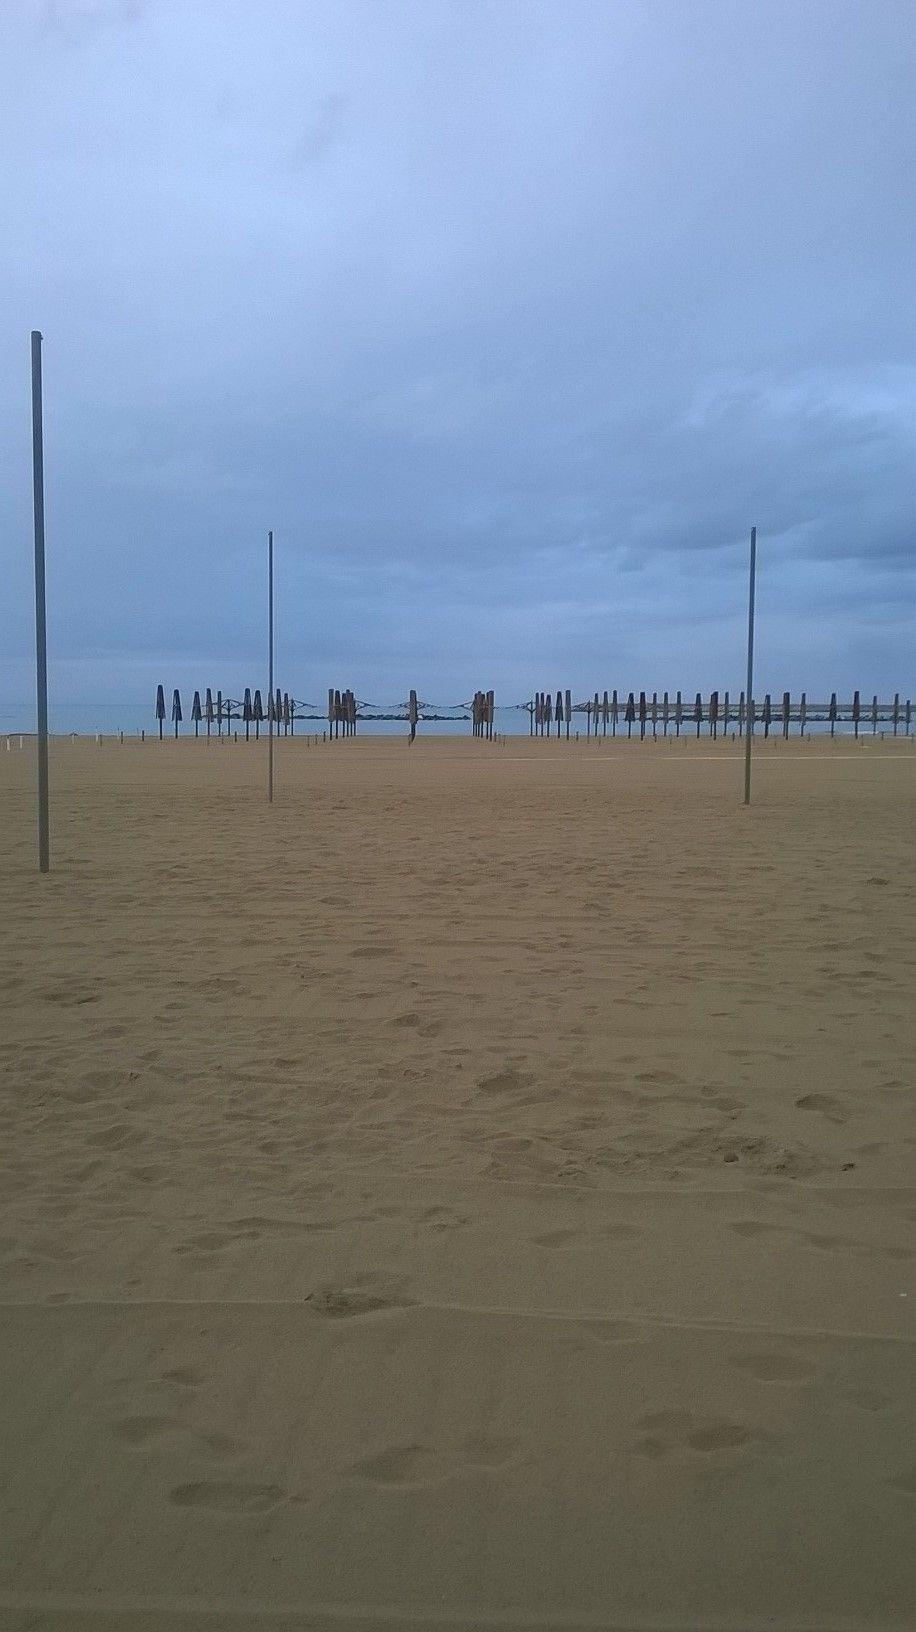 Pescara, Italy: Nicoletta on the beach